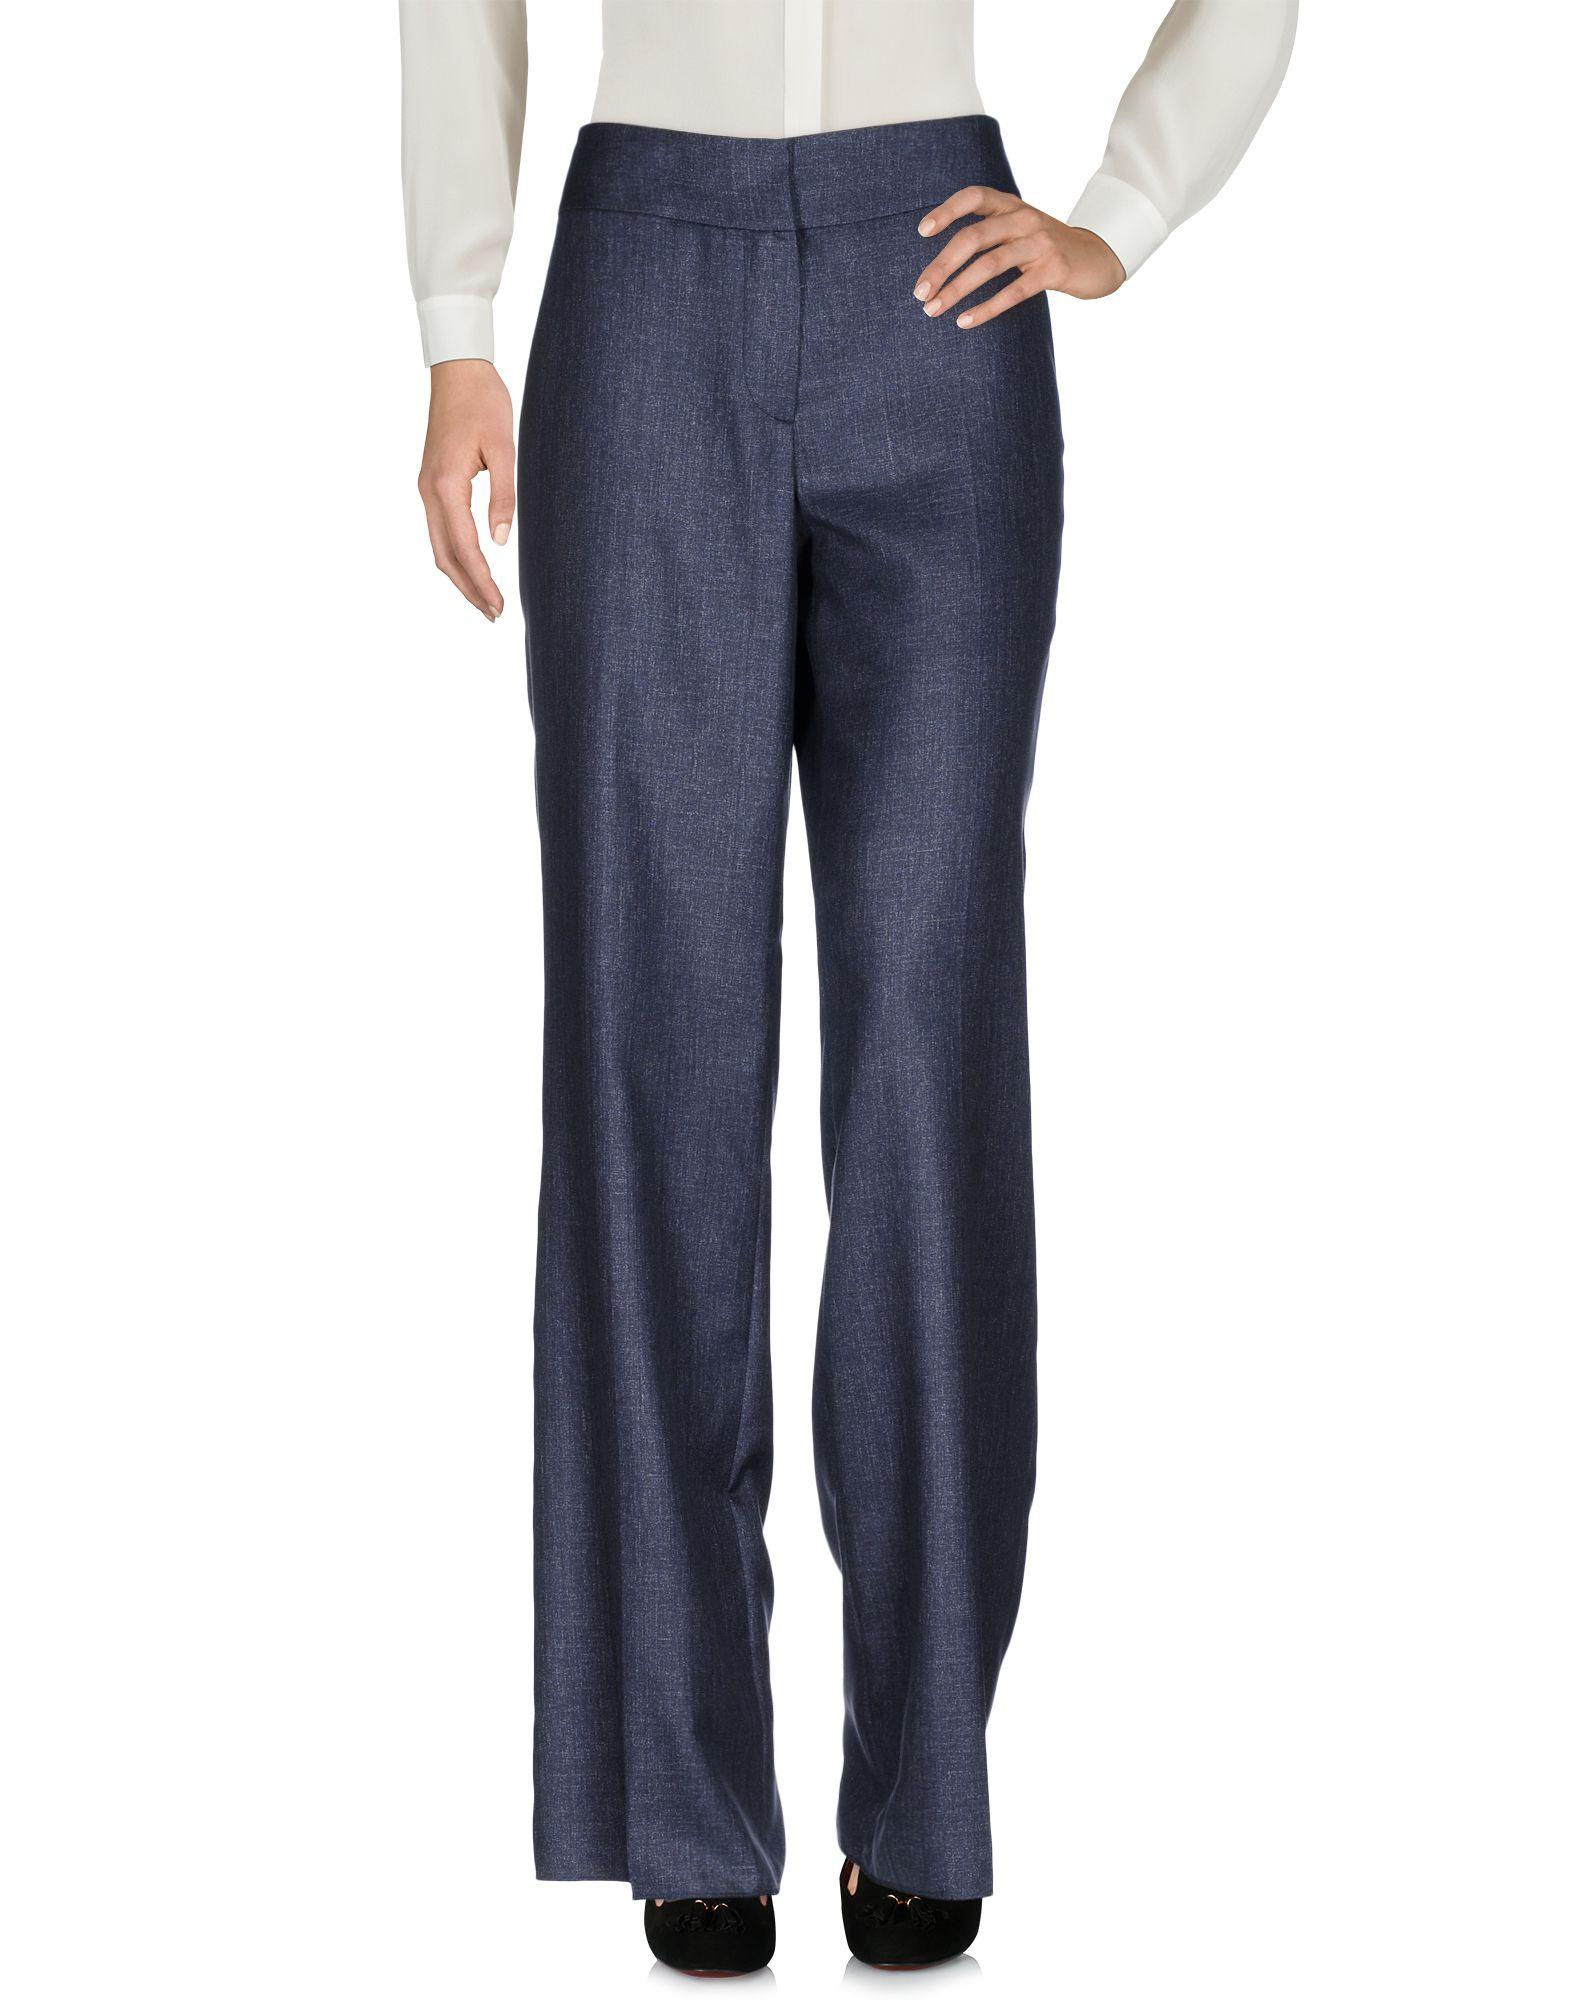 giorgio armani брюки 1942658 серый GIORGIO ARMANI Повседневные брюки